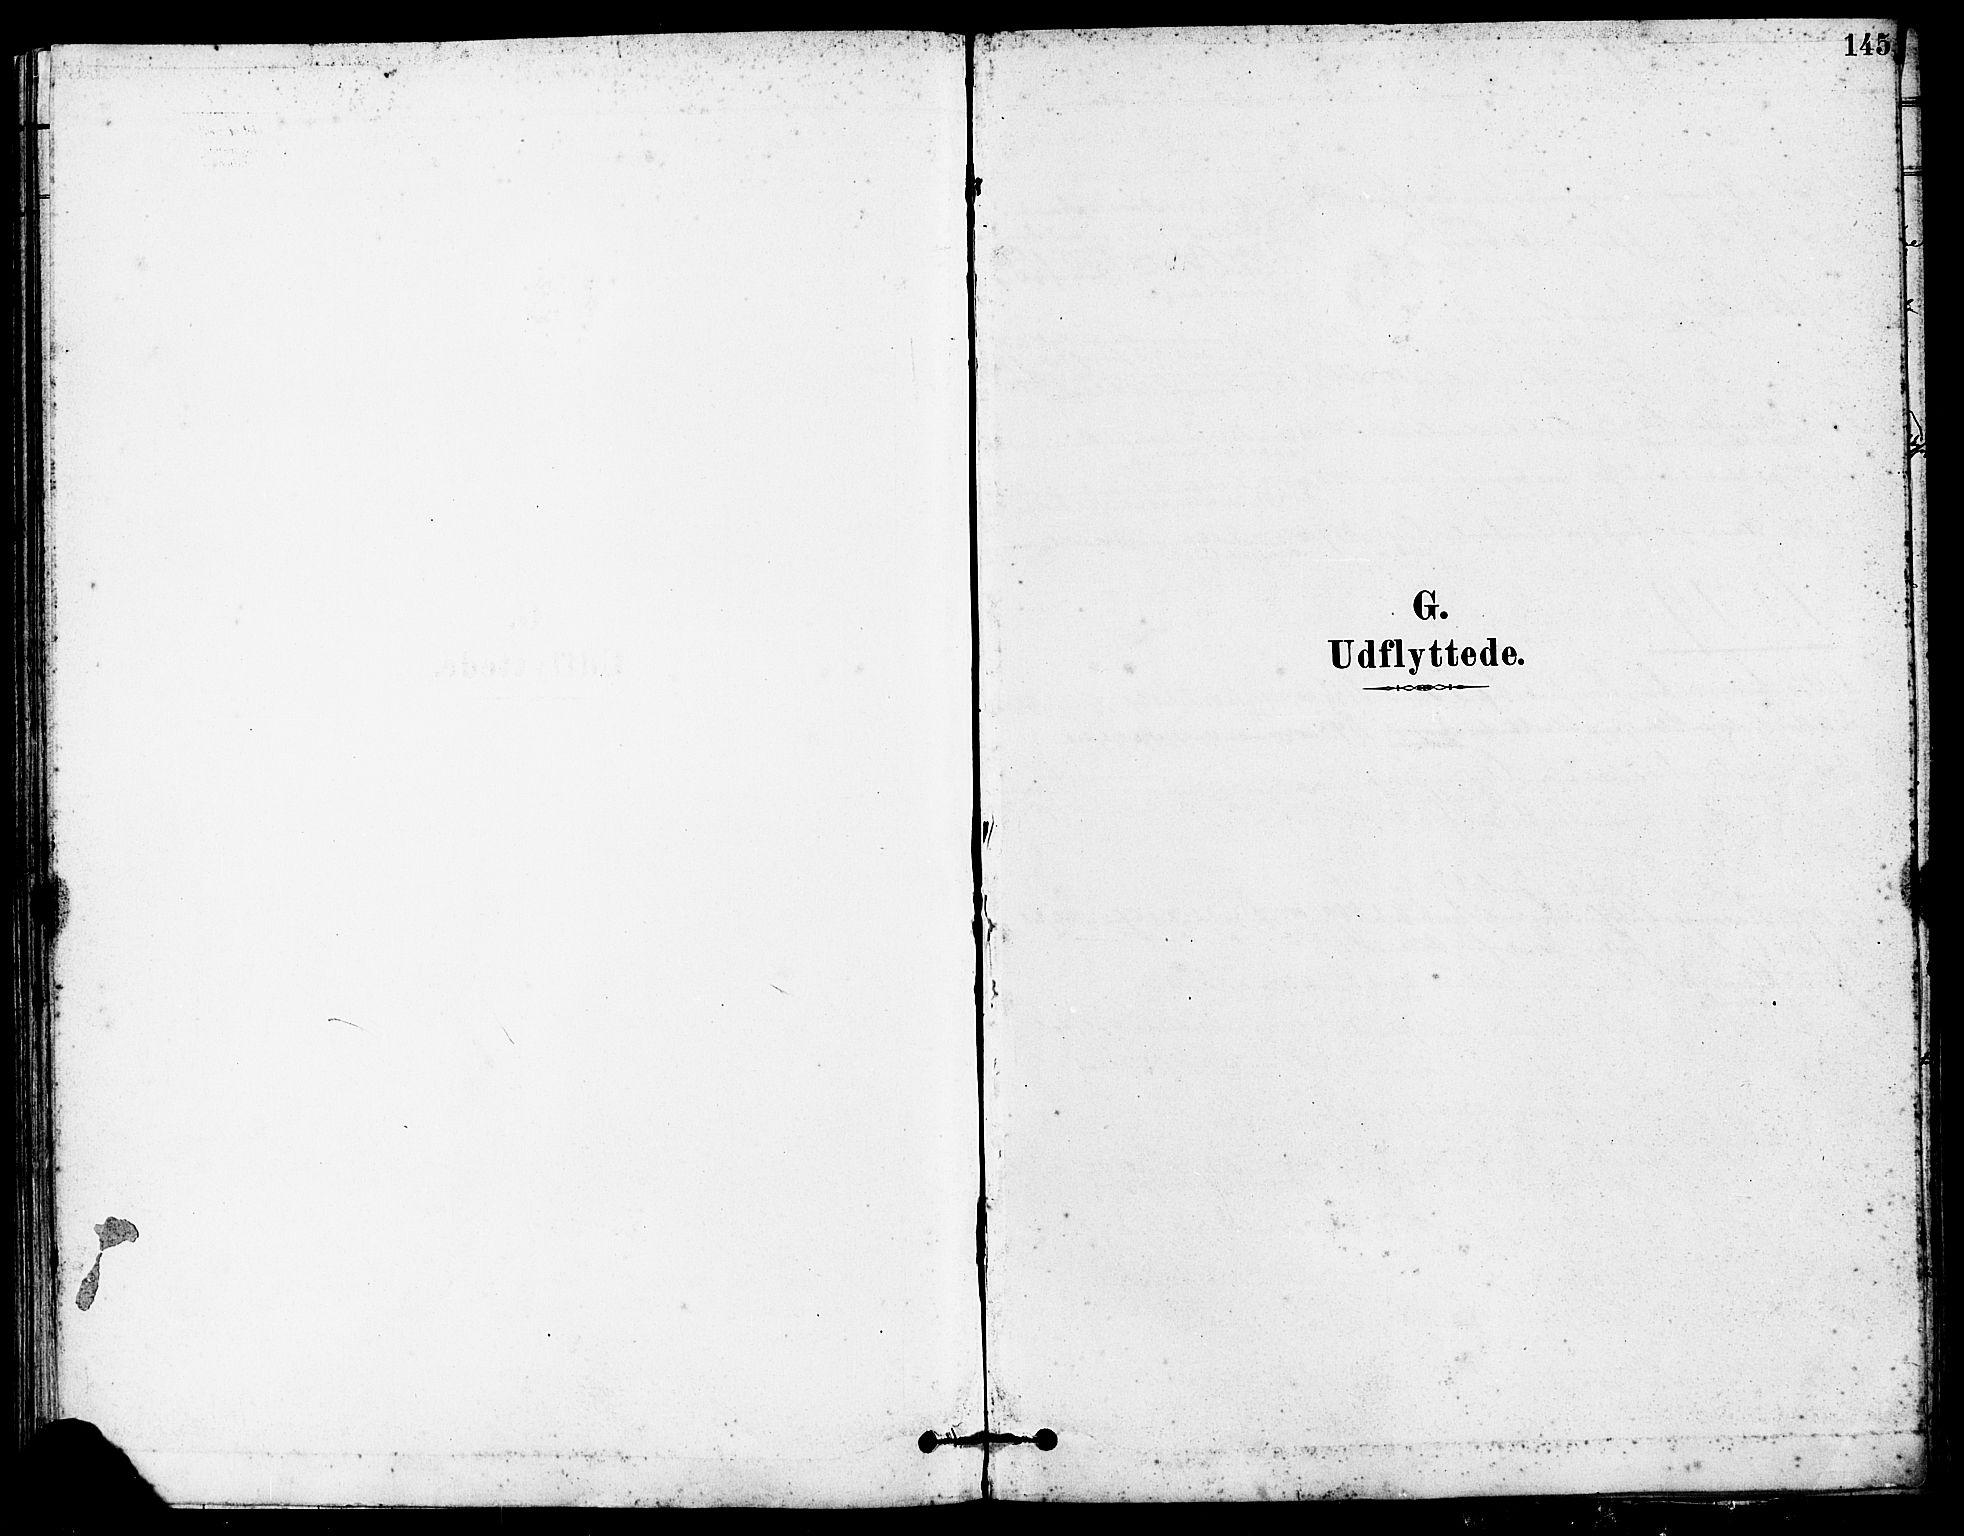 SAST, Høyland sokneprestkontor, 30BA/L0012: Ministerialbok nr. A 11, 1878-1889, s. 145